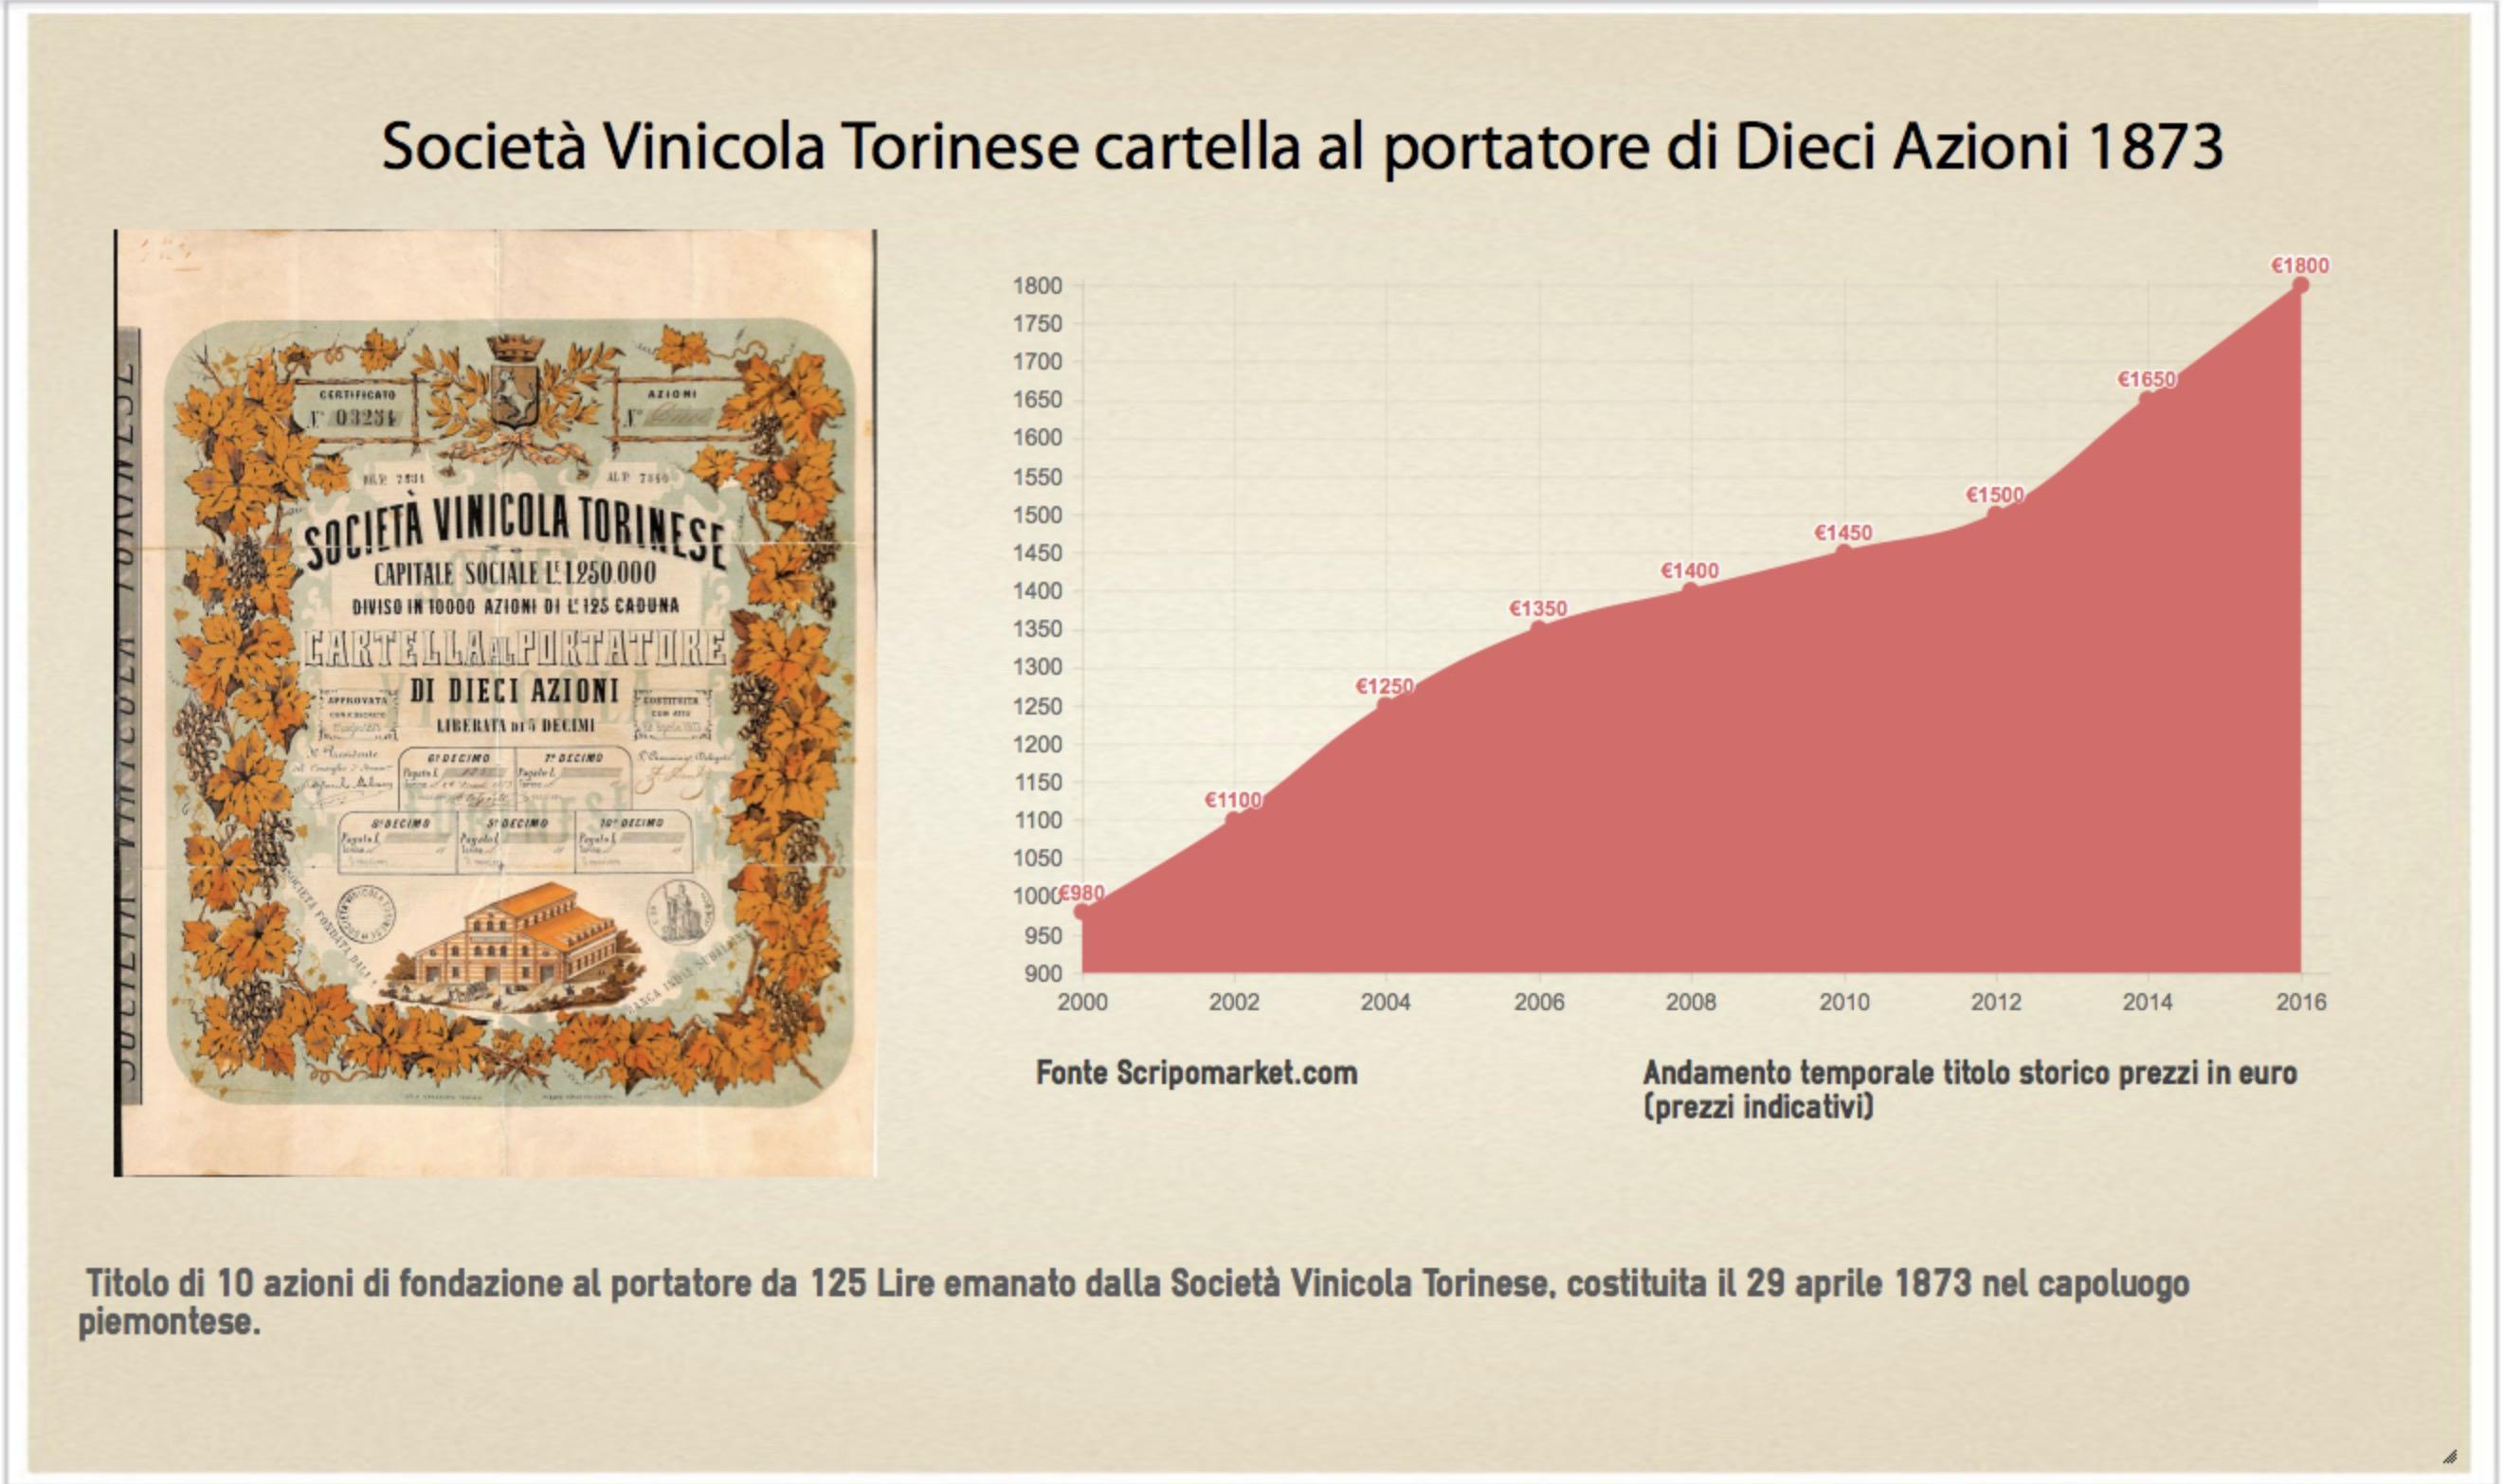 vinicola-torinese-1873